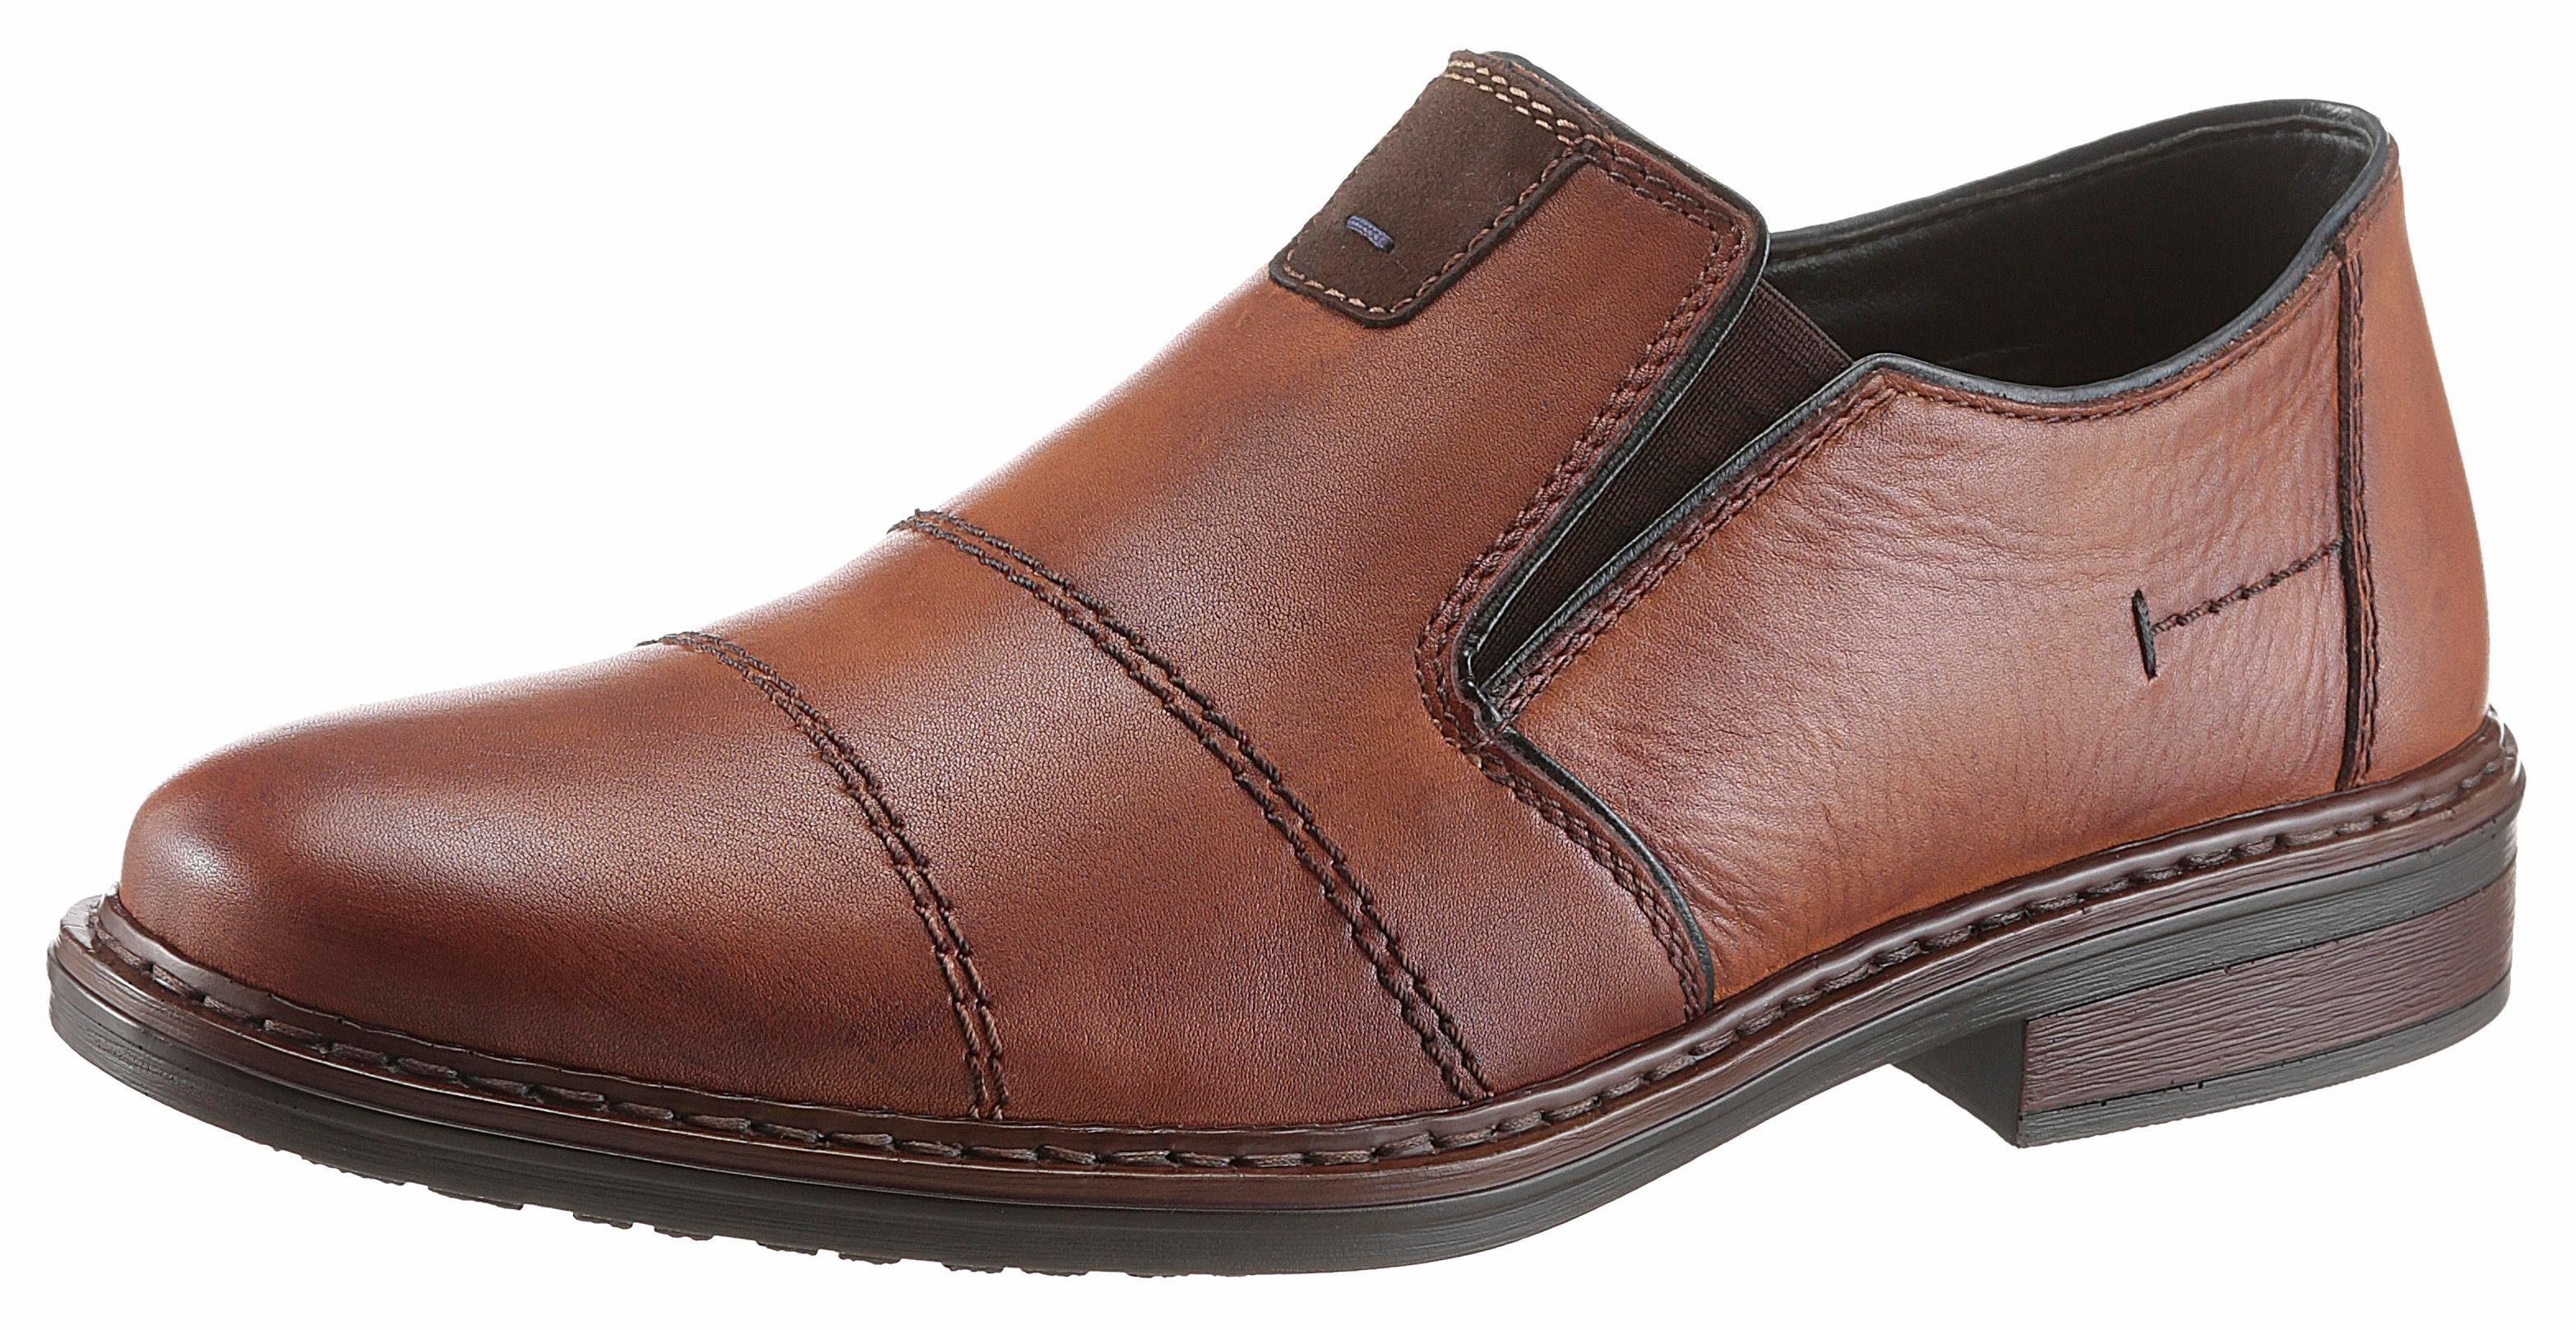 Rieker Brun Chaussures Casual Hommes Occasionnels 3r1FhbC